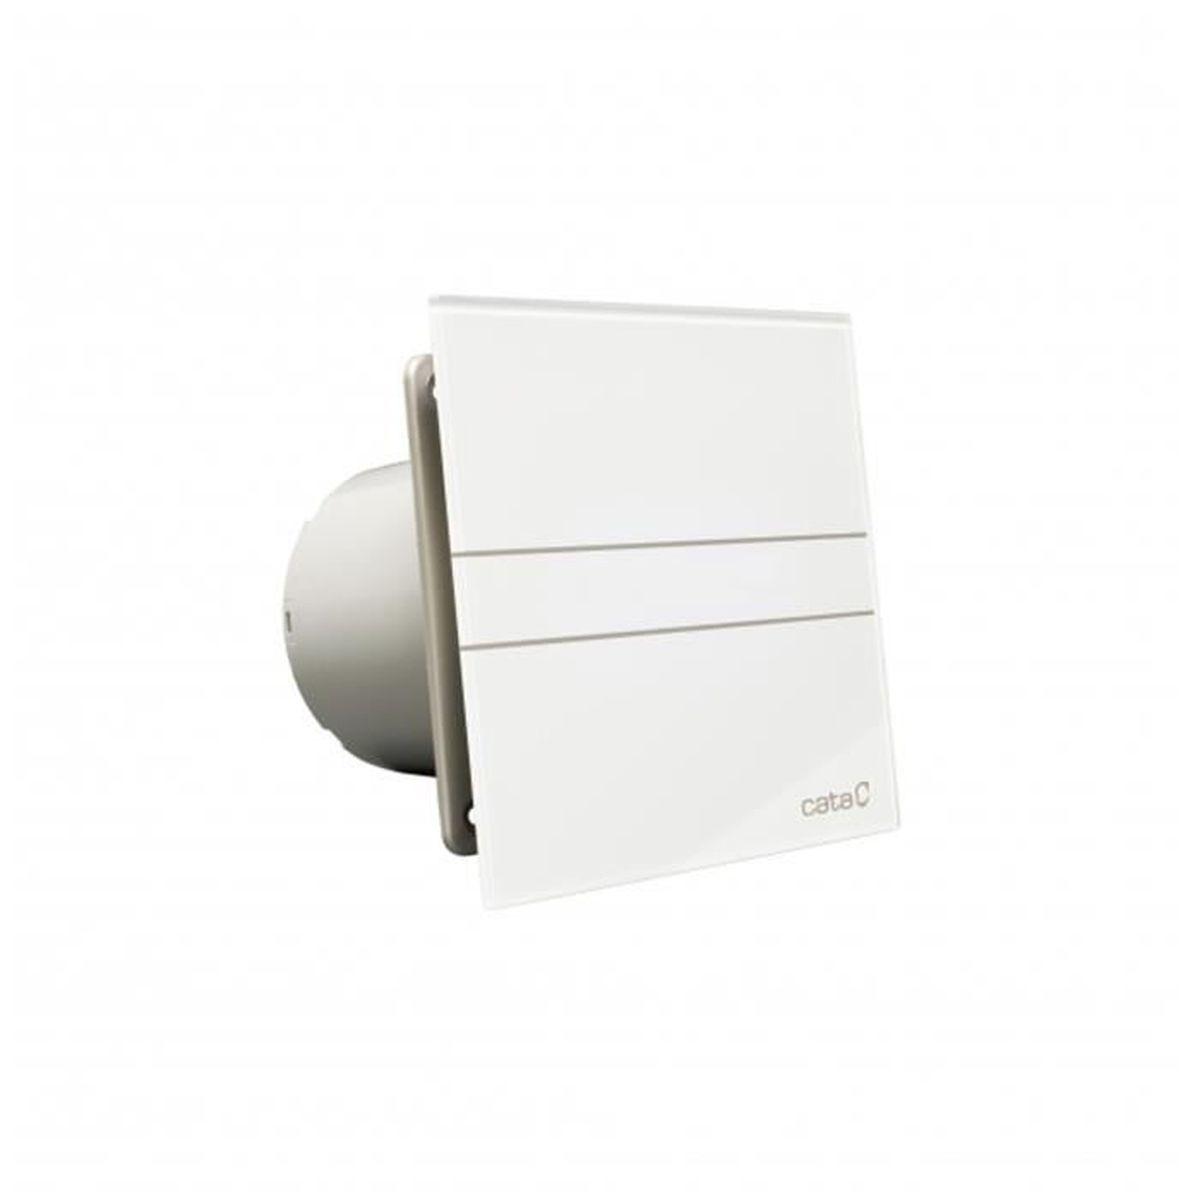 Aérateur extracteur salle de bain E-18 Glass Timer CATA